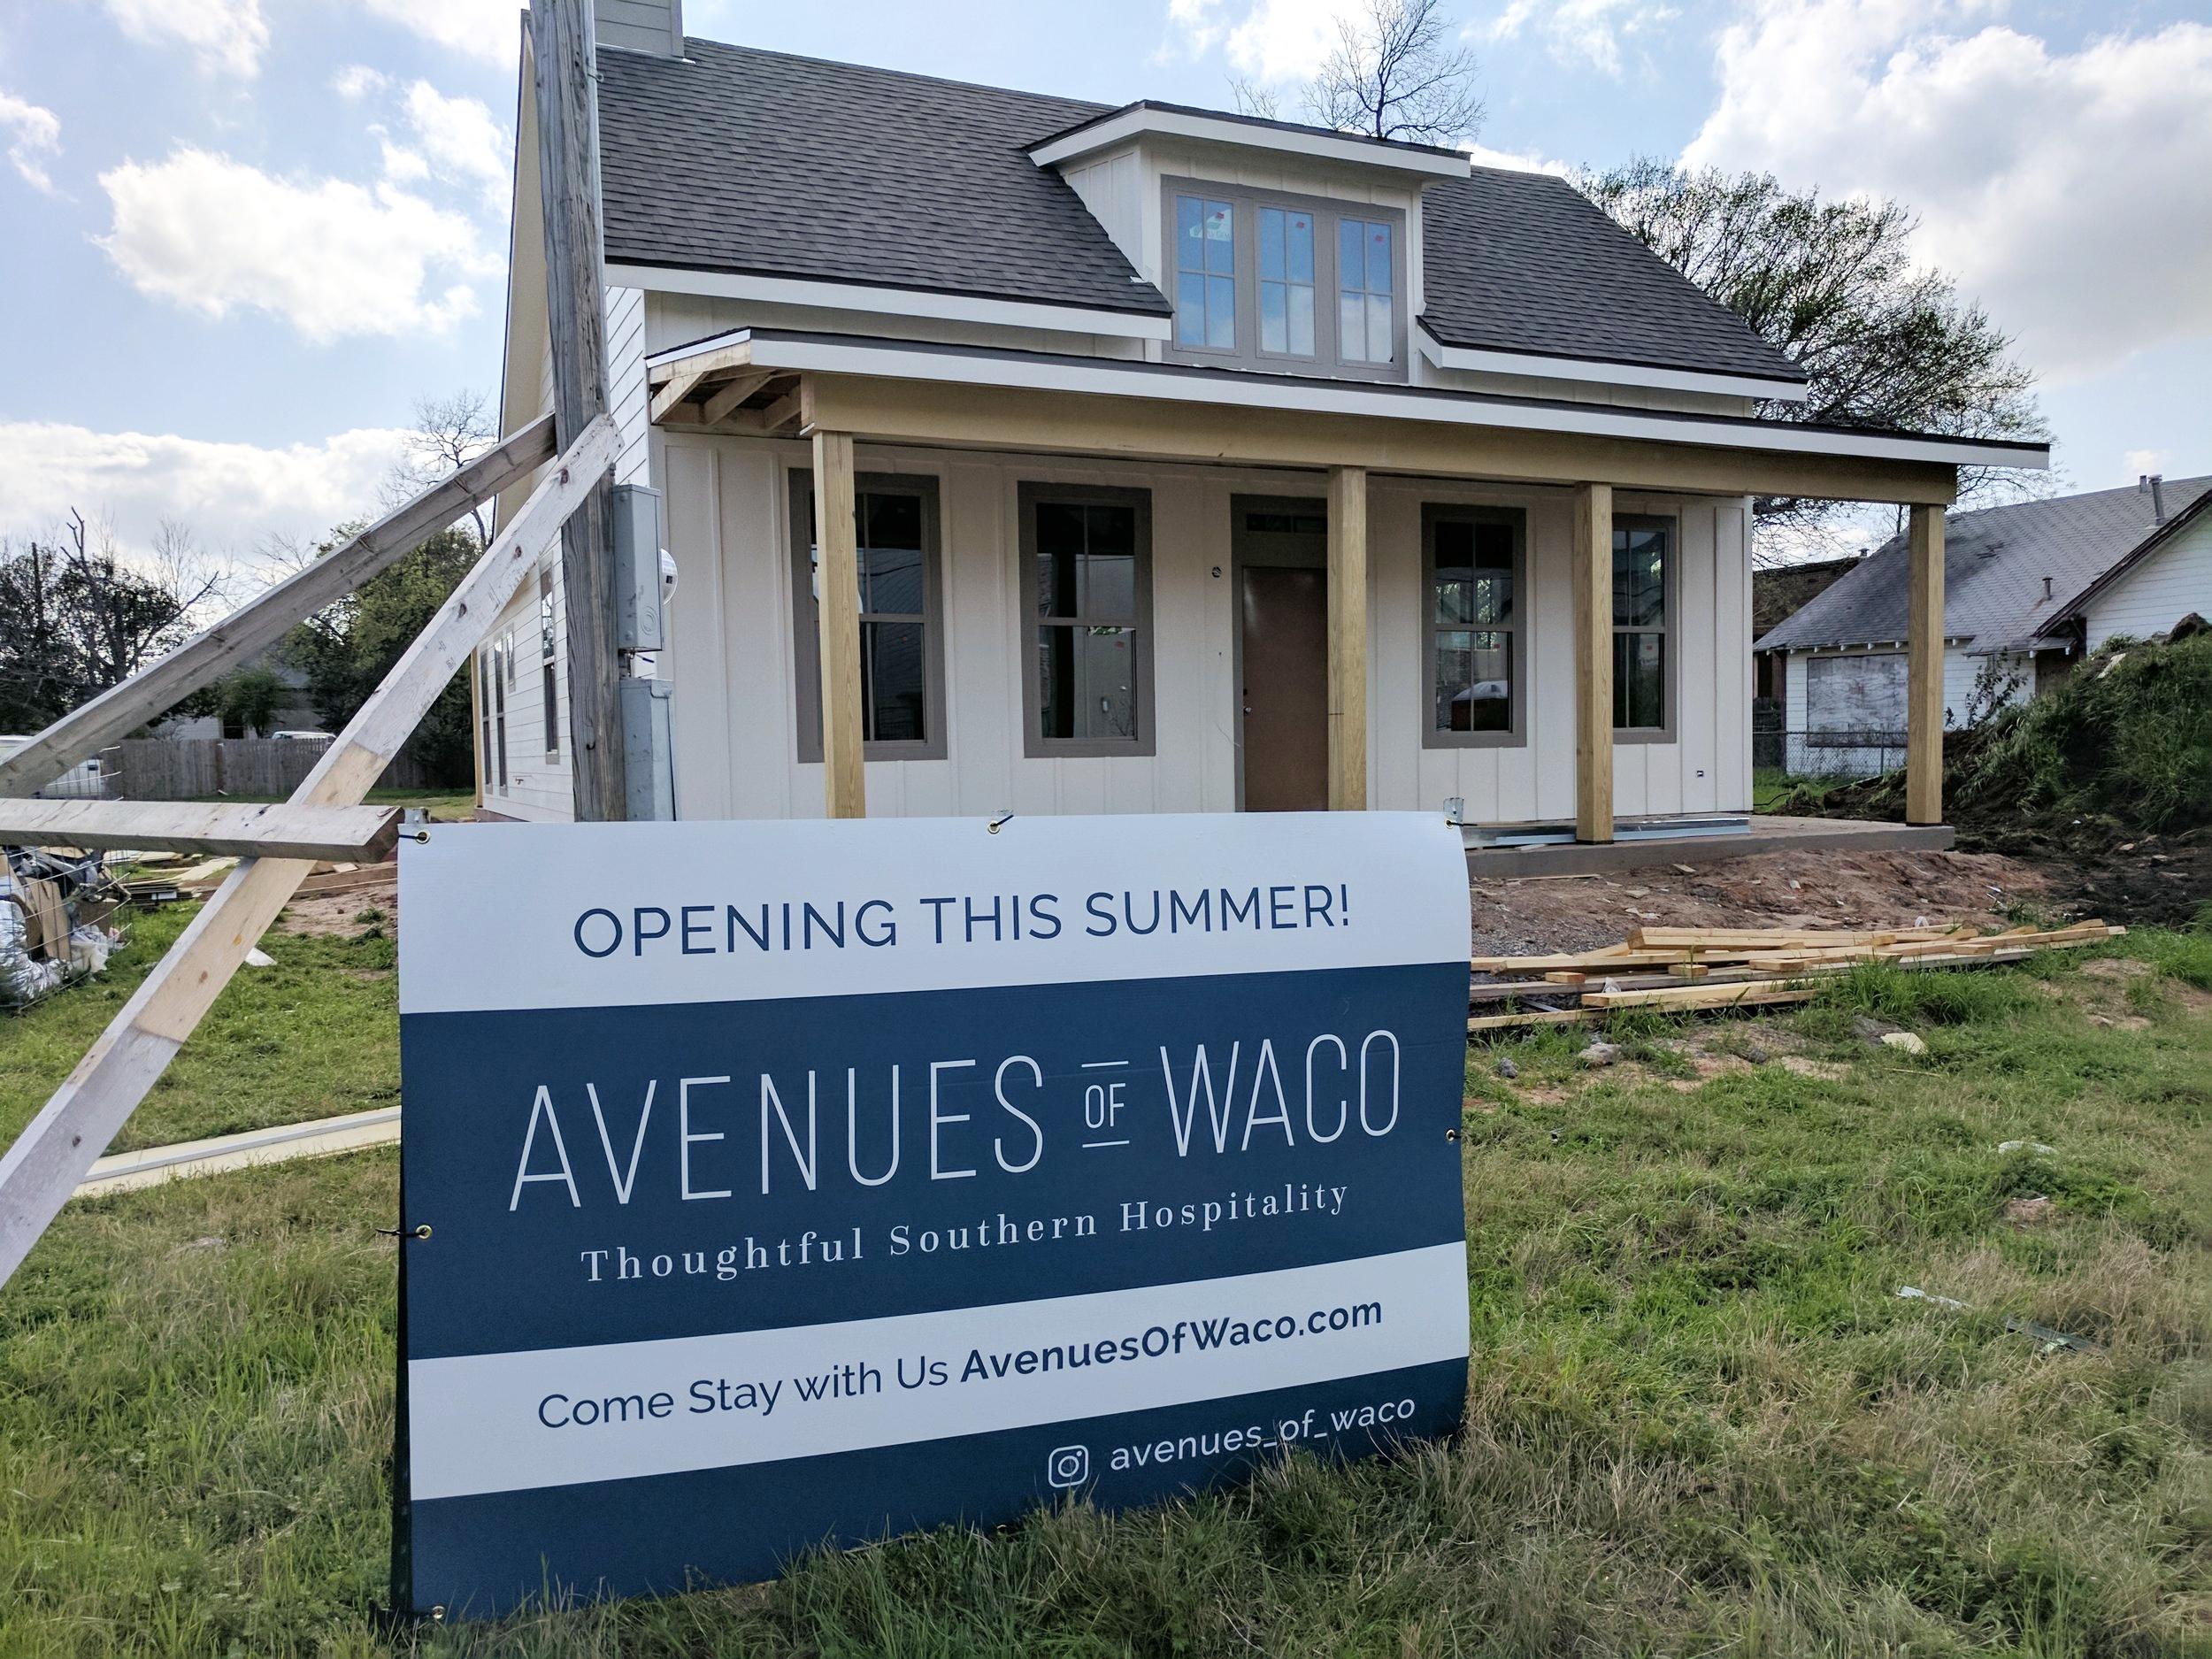 Avenues of Waco